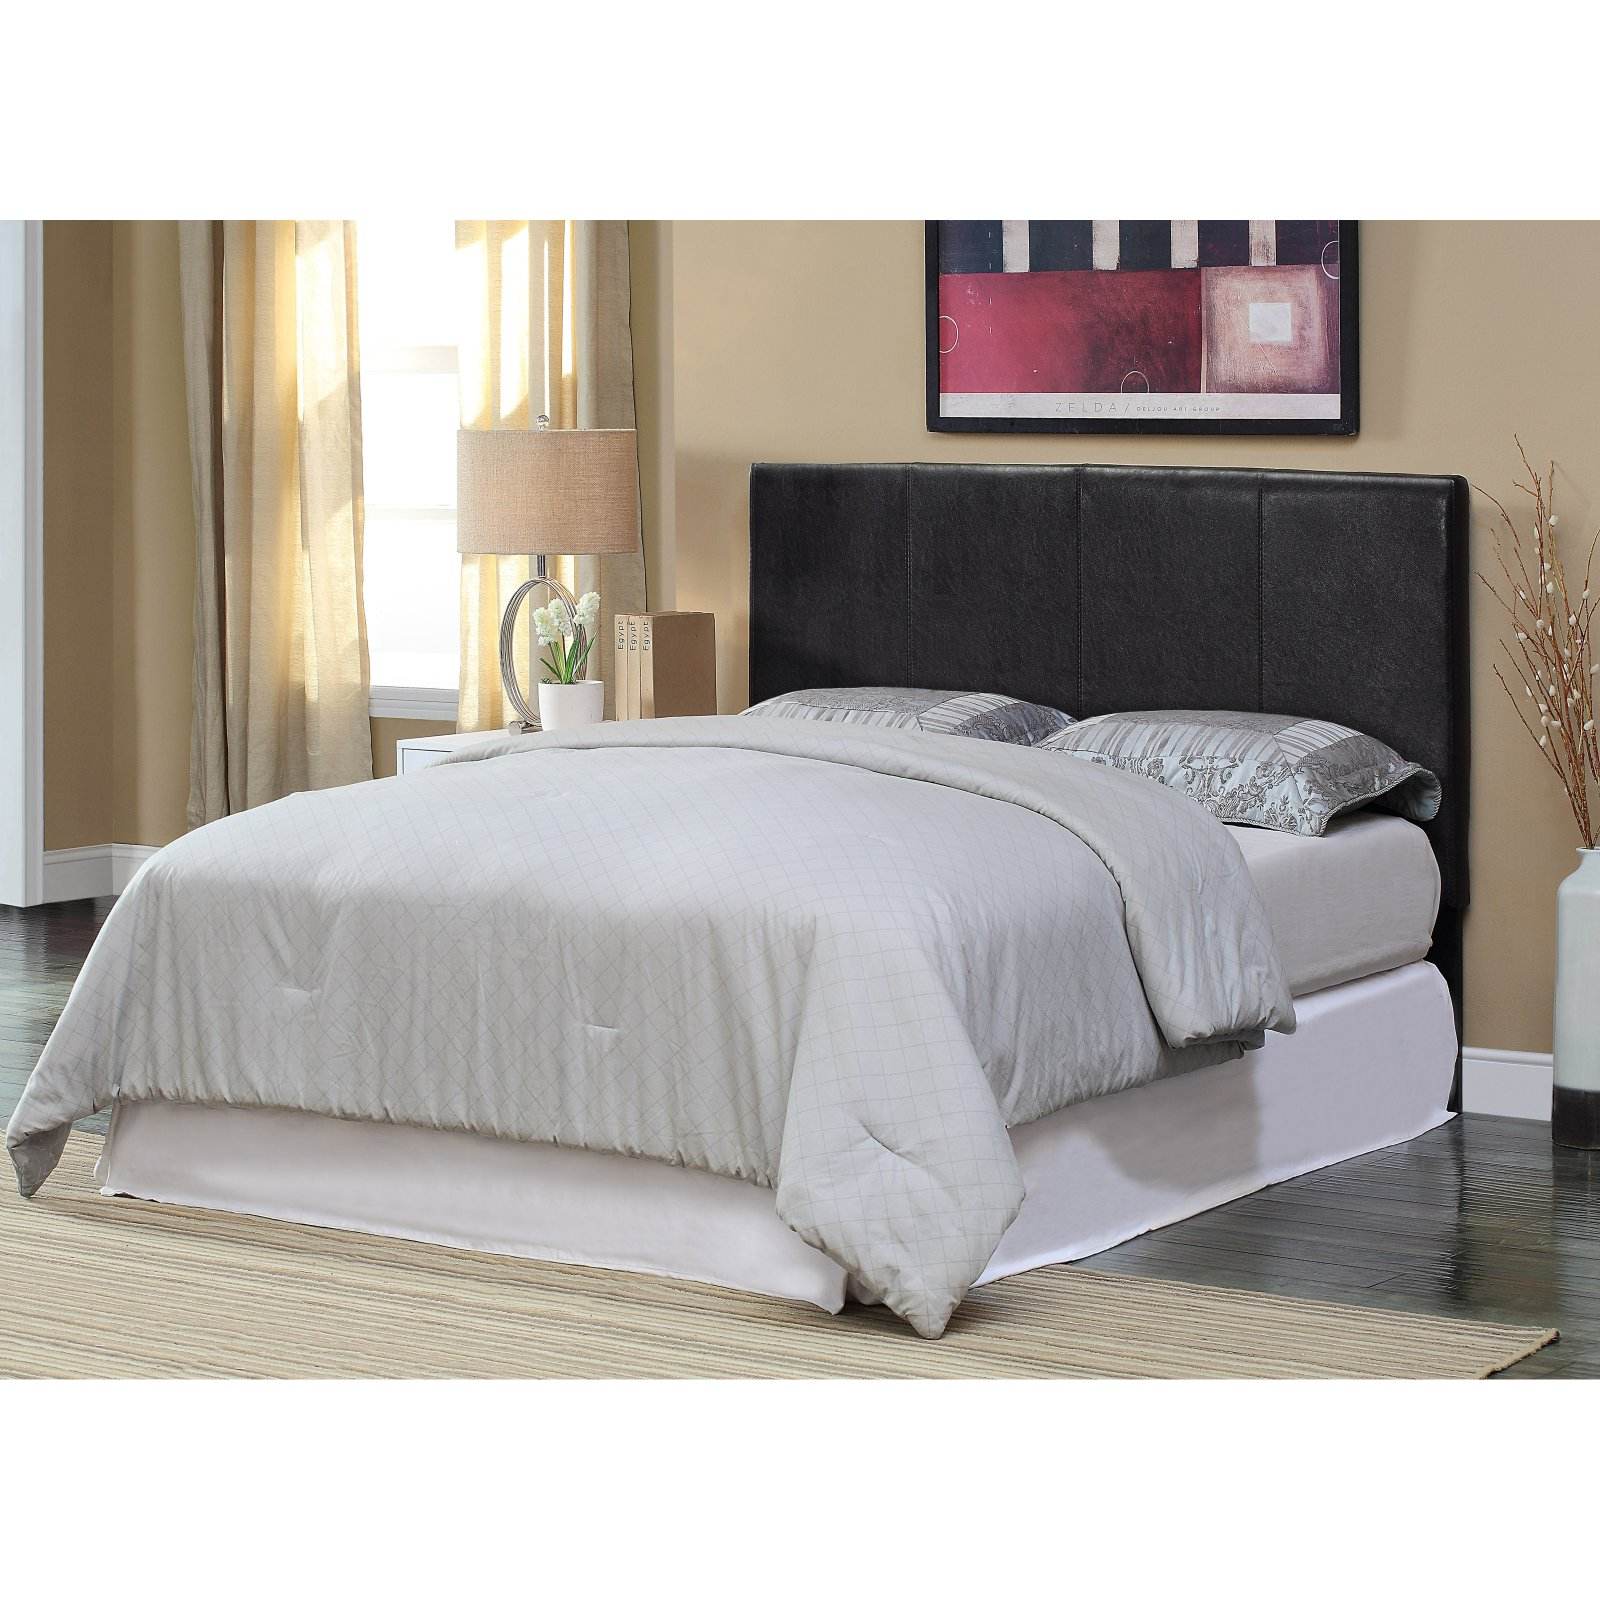 Furniture of America Huntington Upholstered Headboard - Espresso